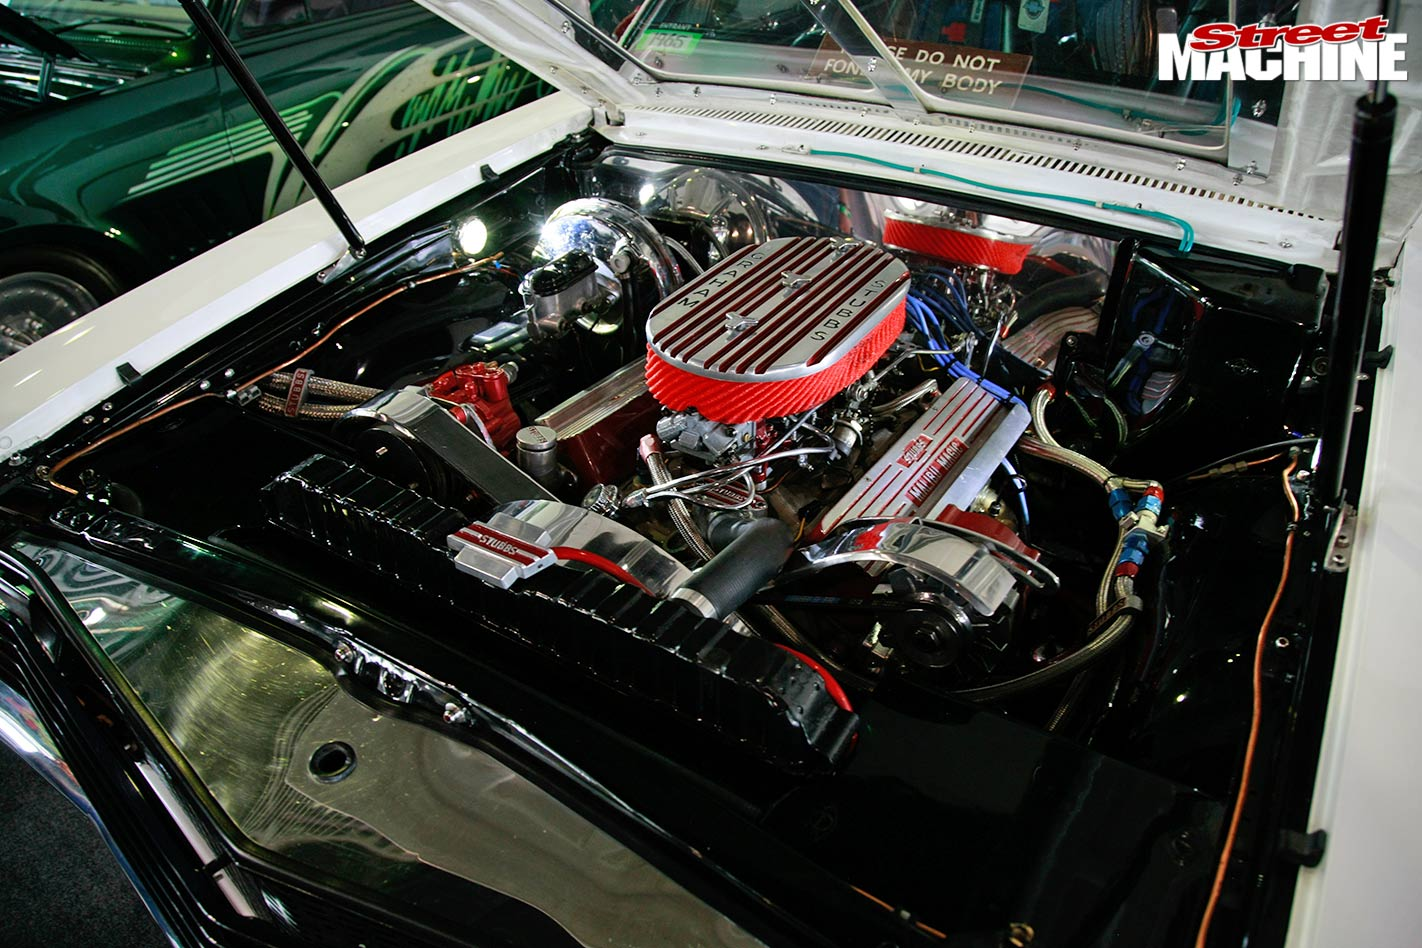 1965 Chev Nova engine bay